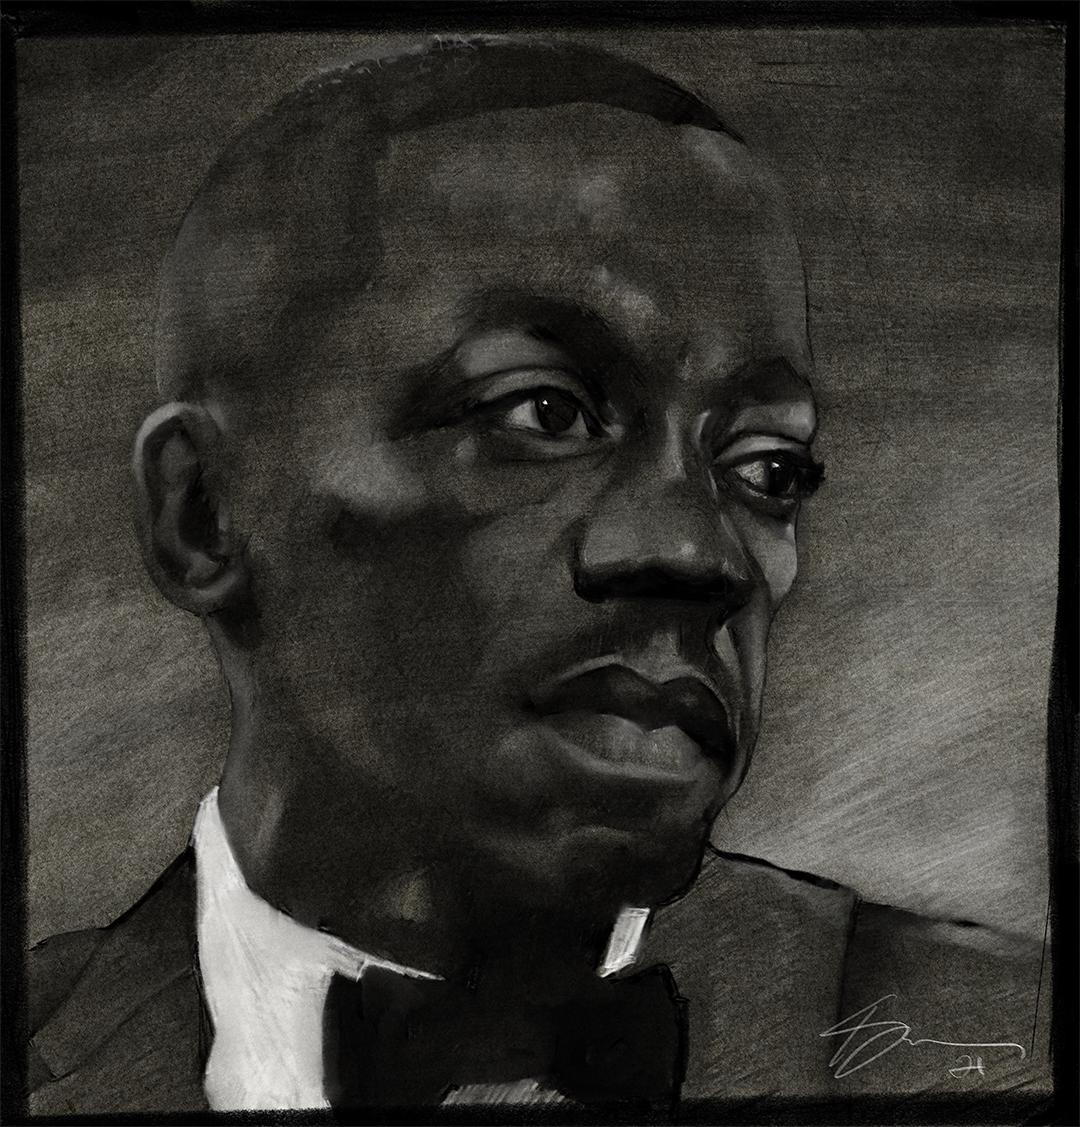 Portrait of Art Blakey